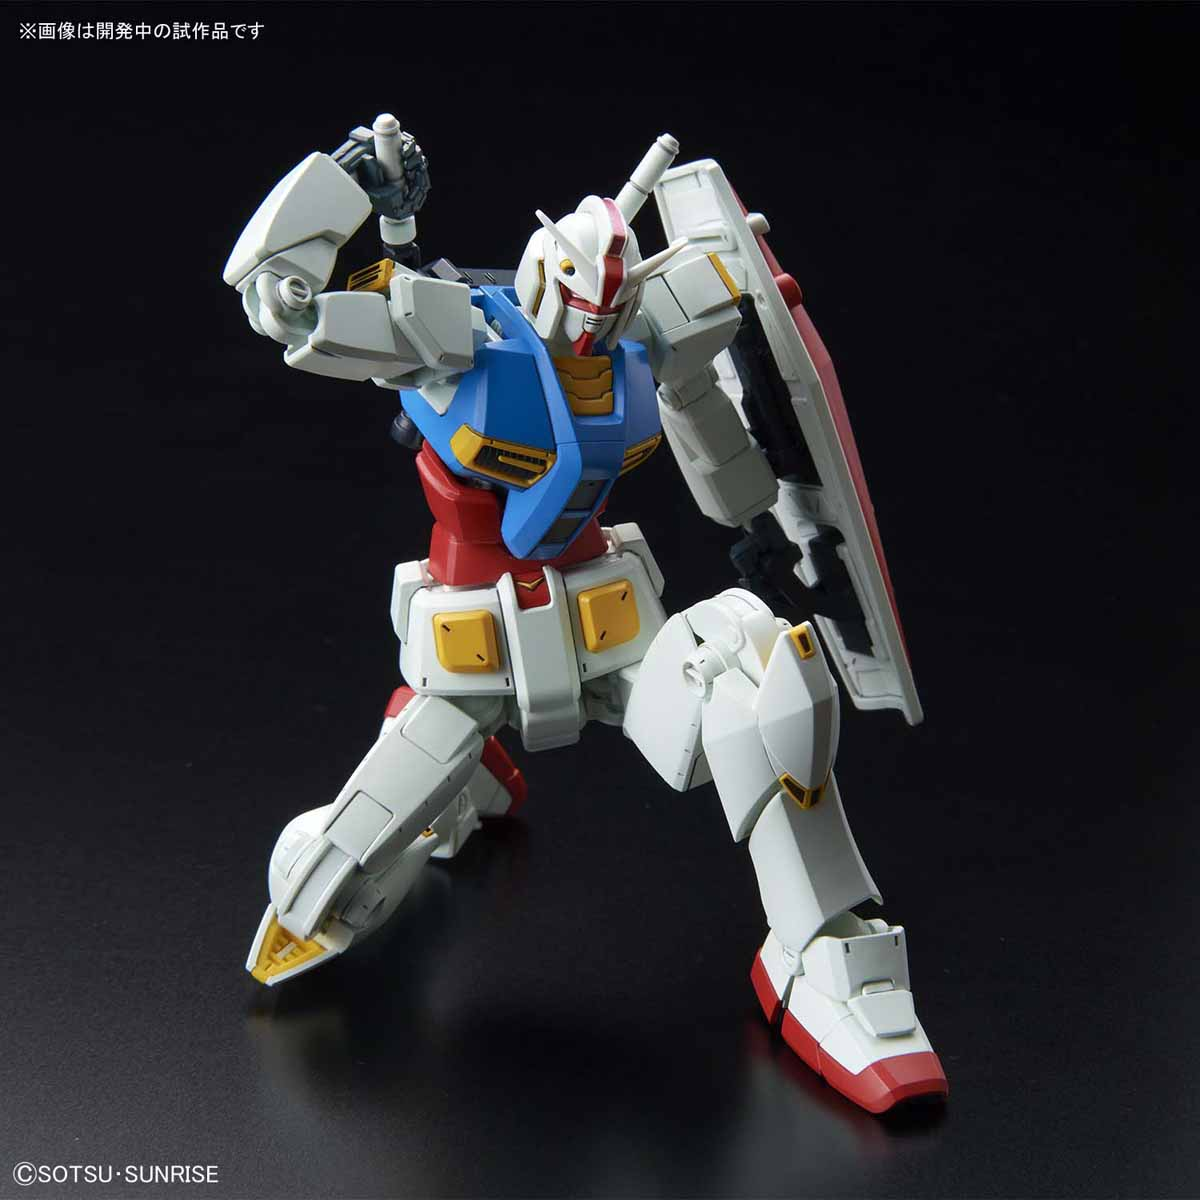 HG 1/144『ガンダムG40(Industrial Design Ver.)』プラモデル-003